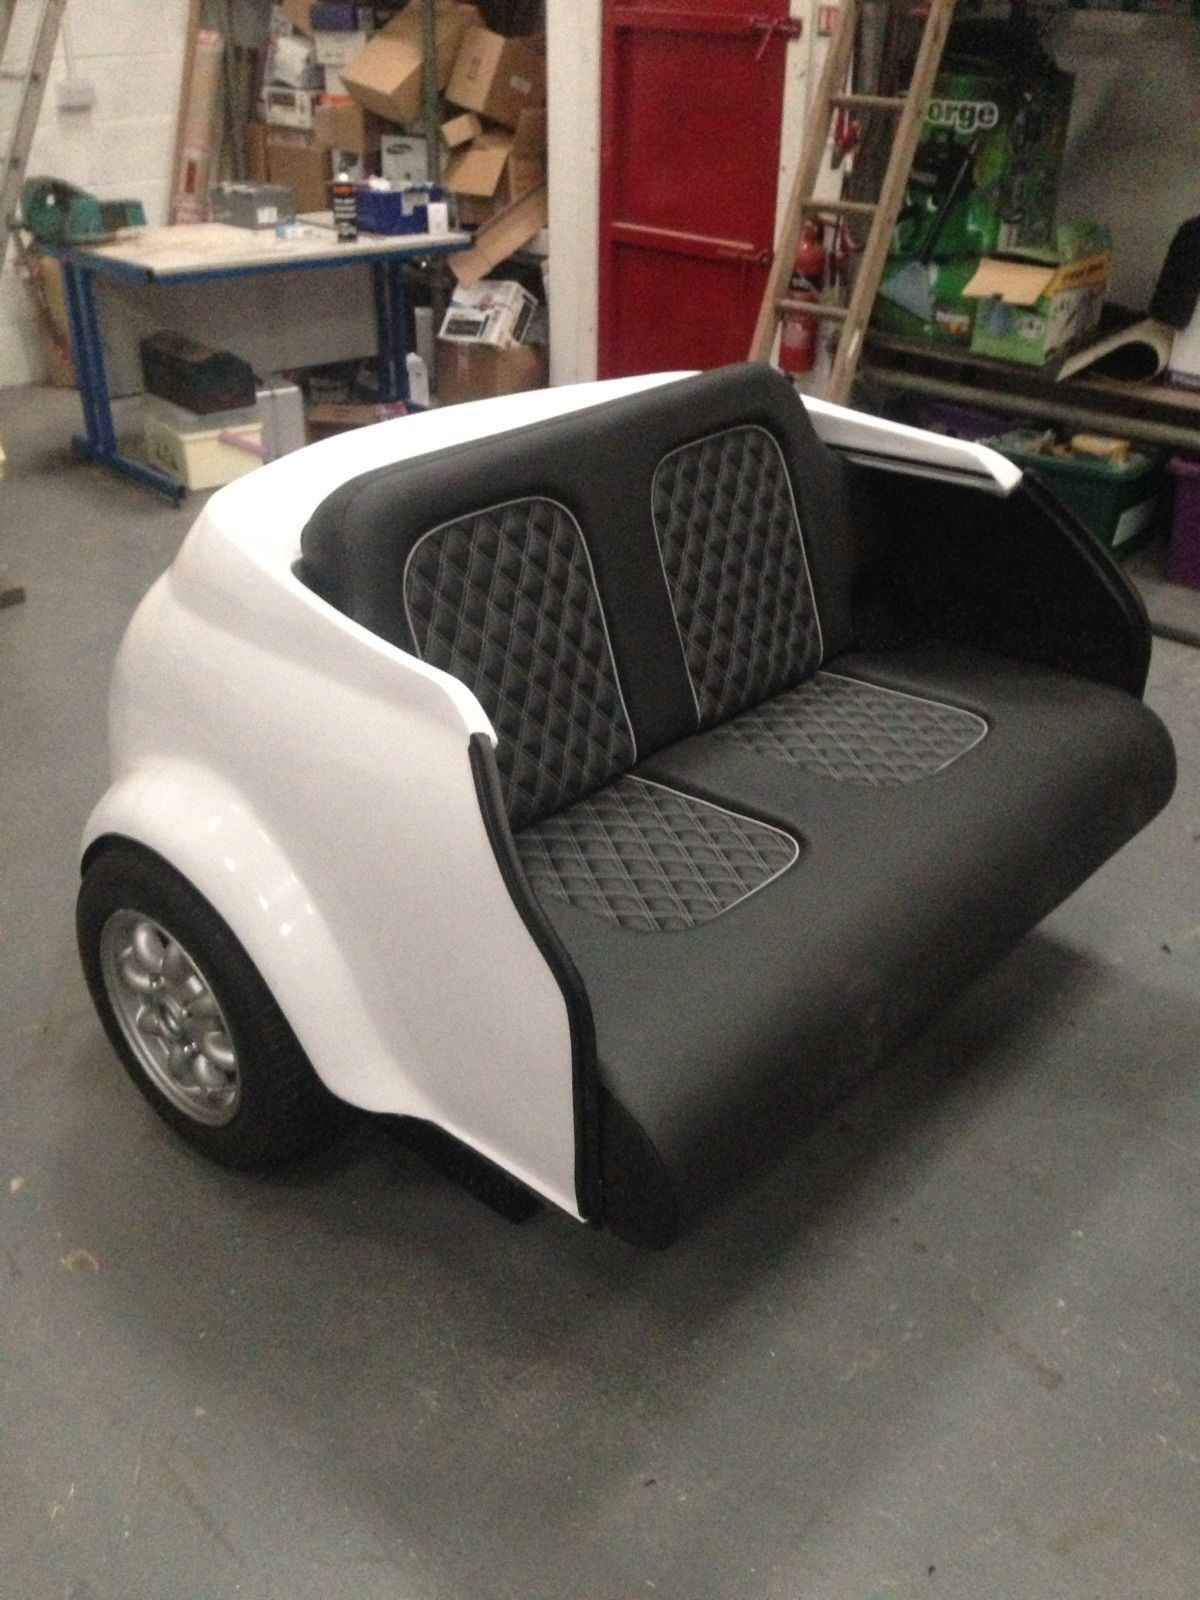 Cars Sofa Chair Harris Tweed Dfs Classic White Mini Cooper Amazing Car Transformed